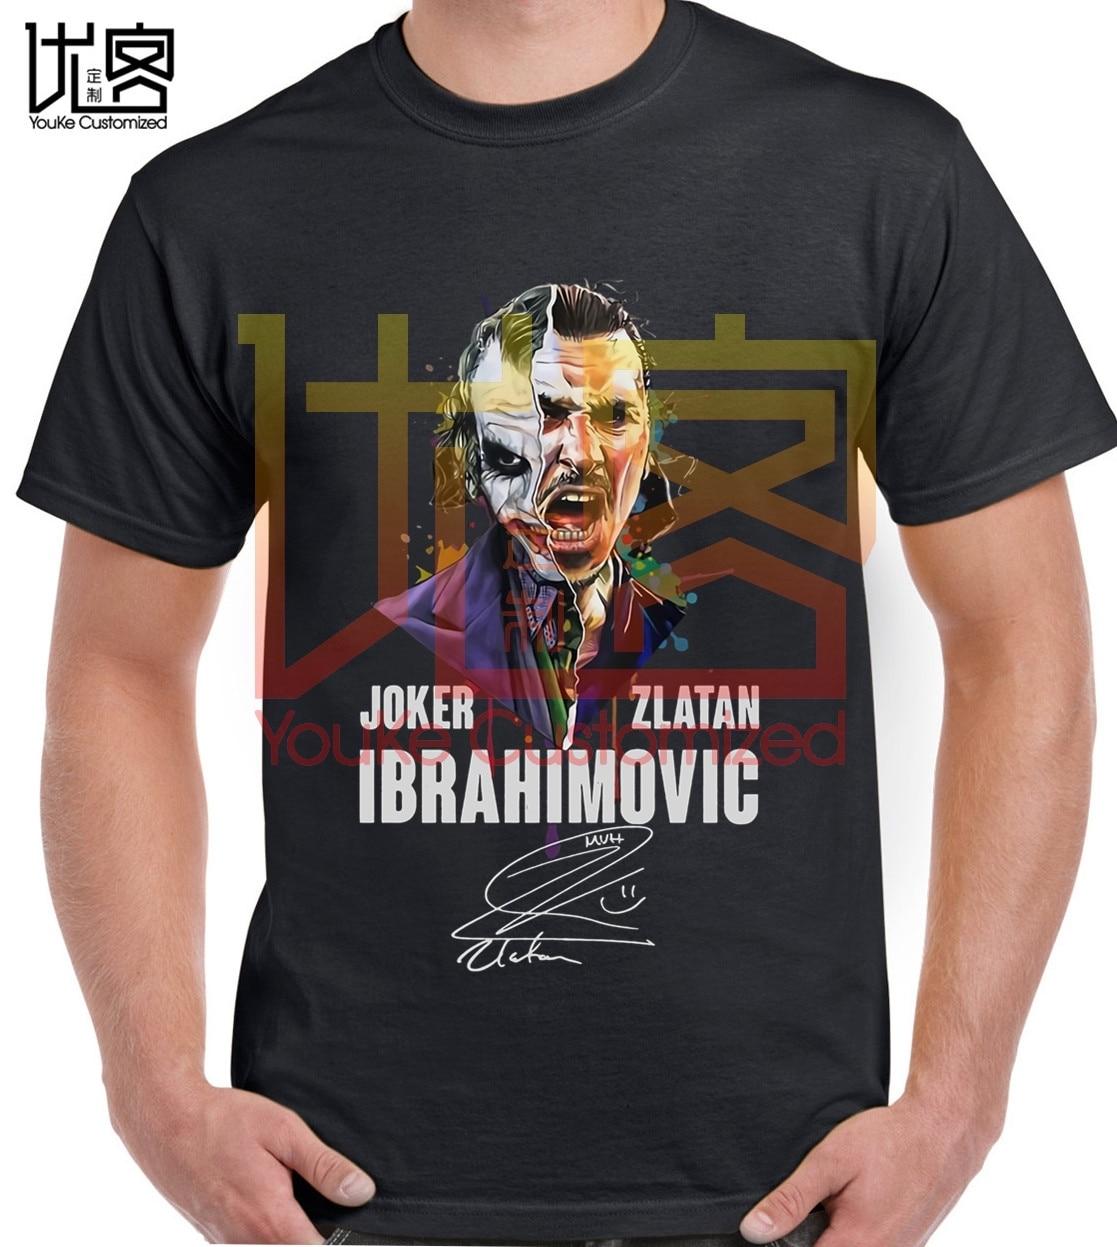 Joker-Zlatan-Ibrahimovic-signature-shirt Men's Women's 100% Cotton Short Sleeves Tops Tee Printed Crewneck Casual T-shirt